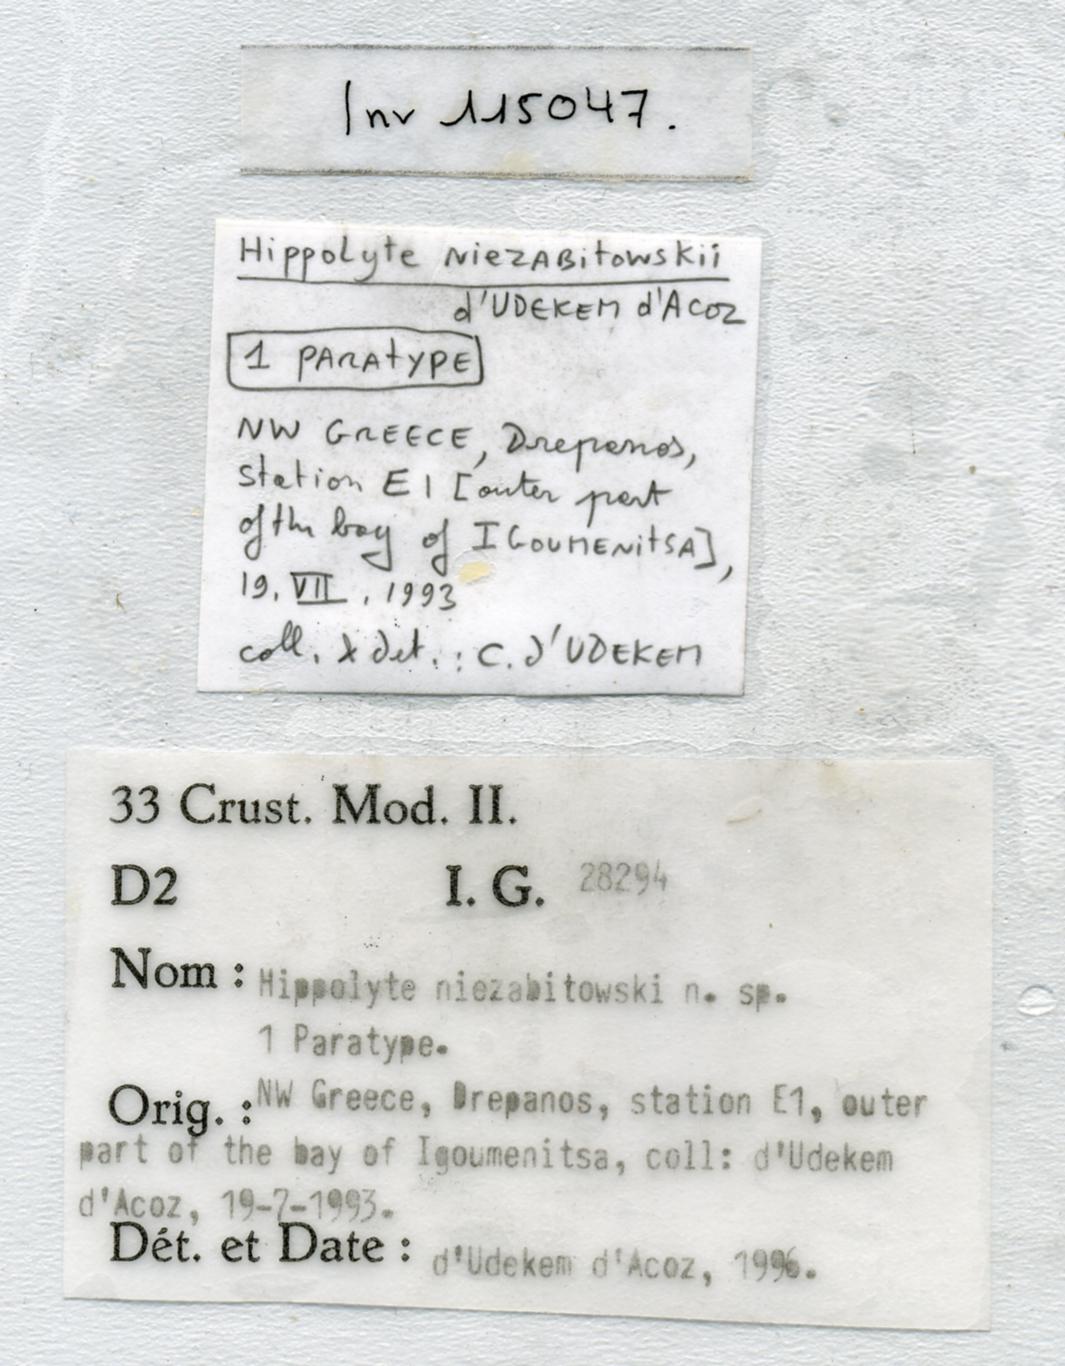 Hippolyte niezabitowskii d'Udekem d'Acoz, 1996 - label